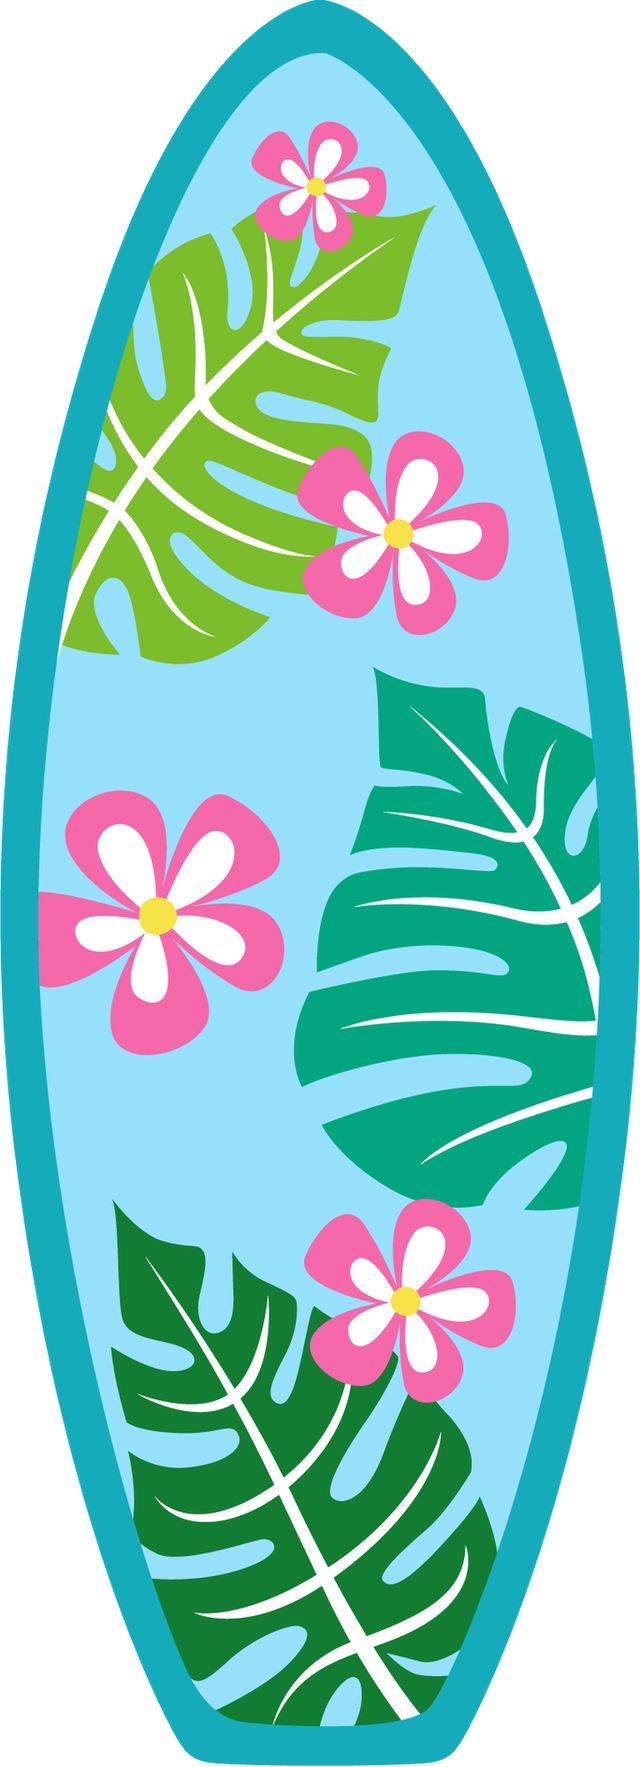 640x1767 Pin By Maria Queiroz On Luau Moana, Luau And Clip Art